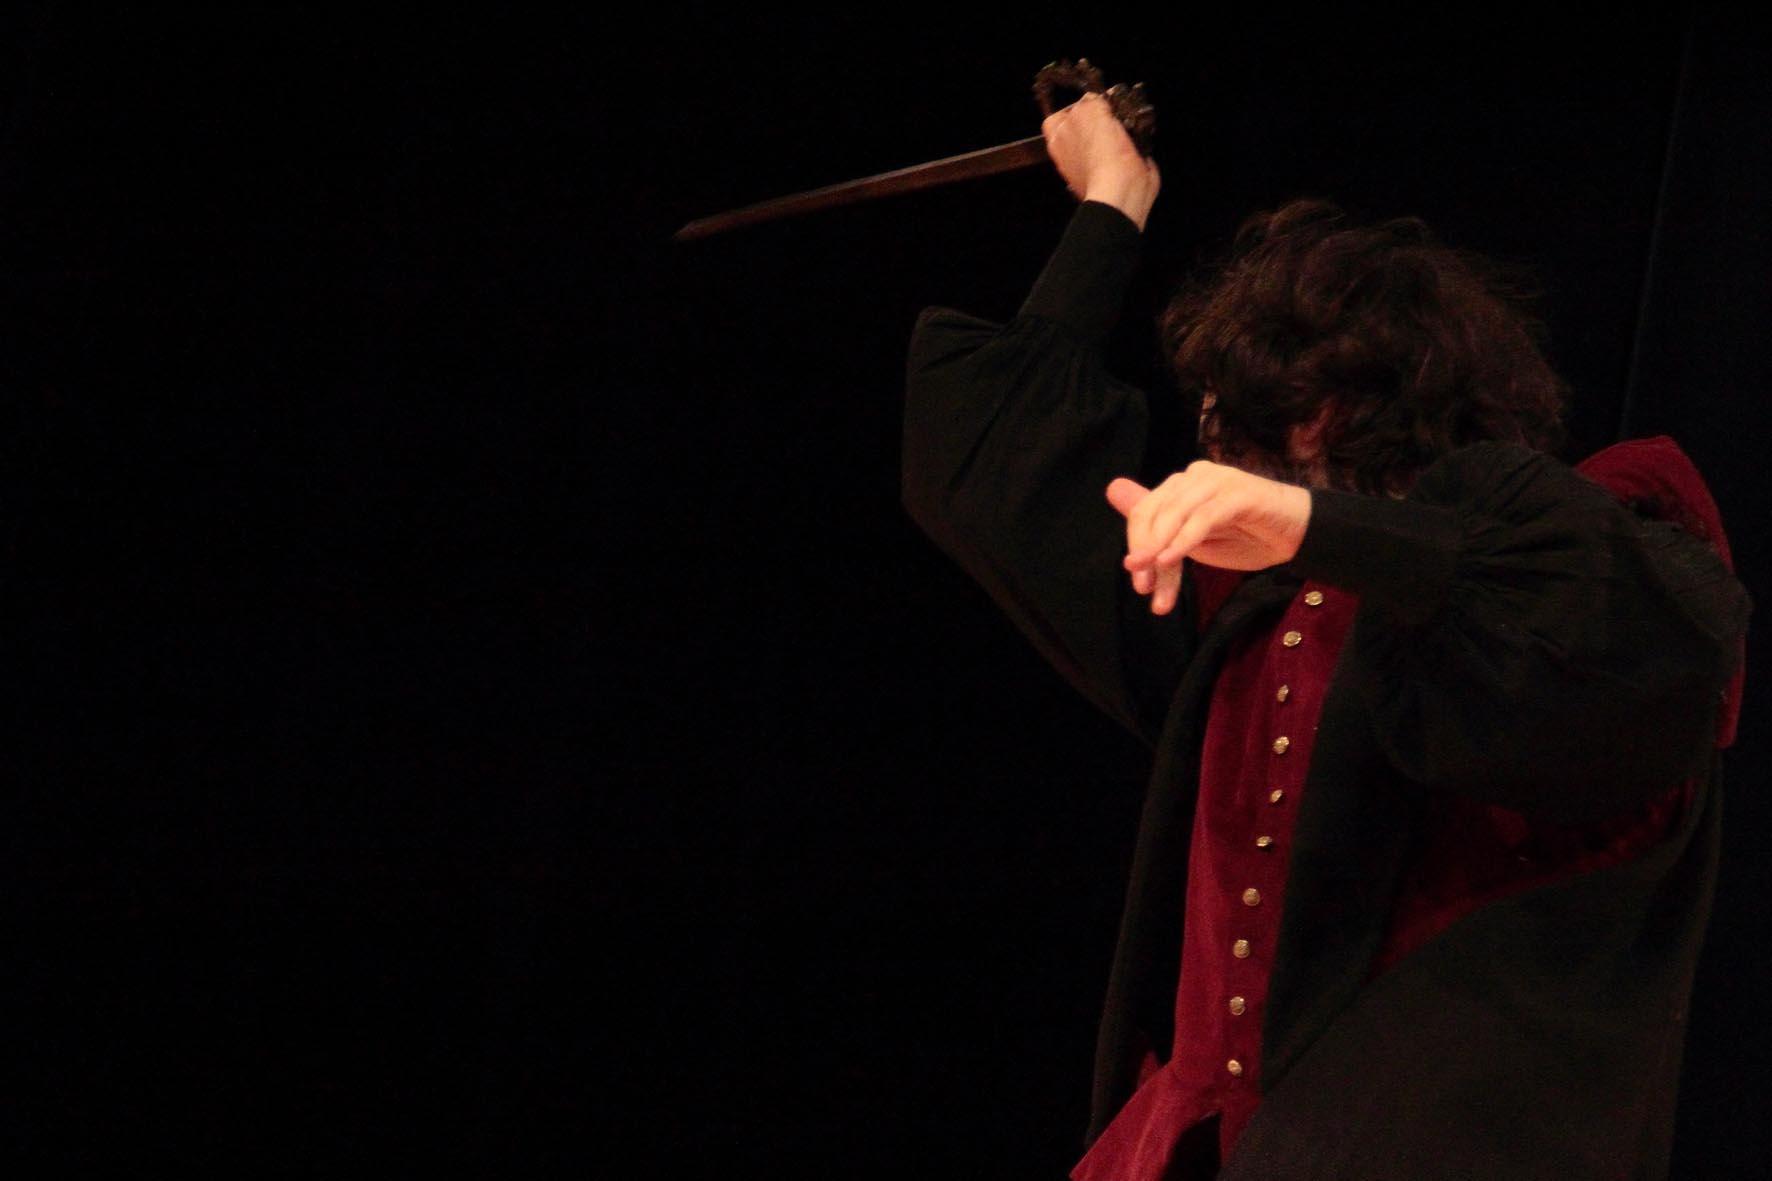 Lorenzo épée desarticulé.jpg